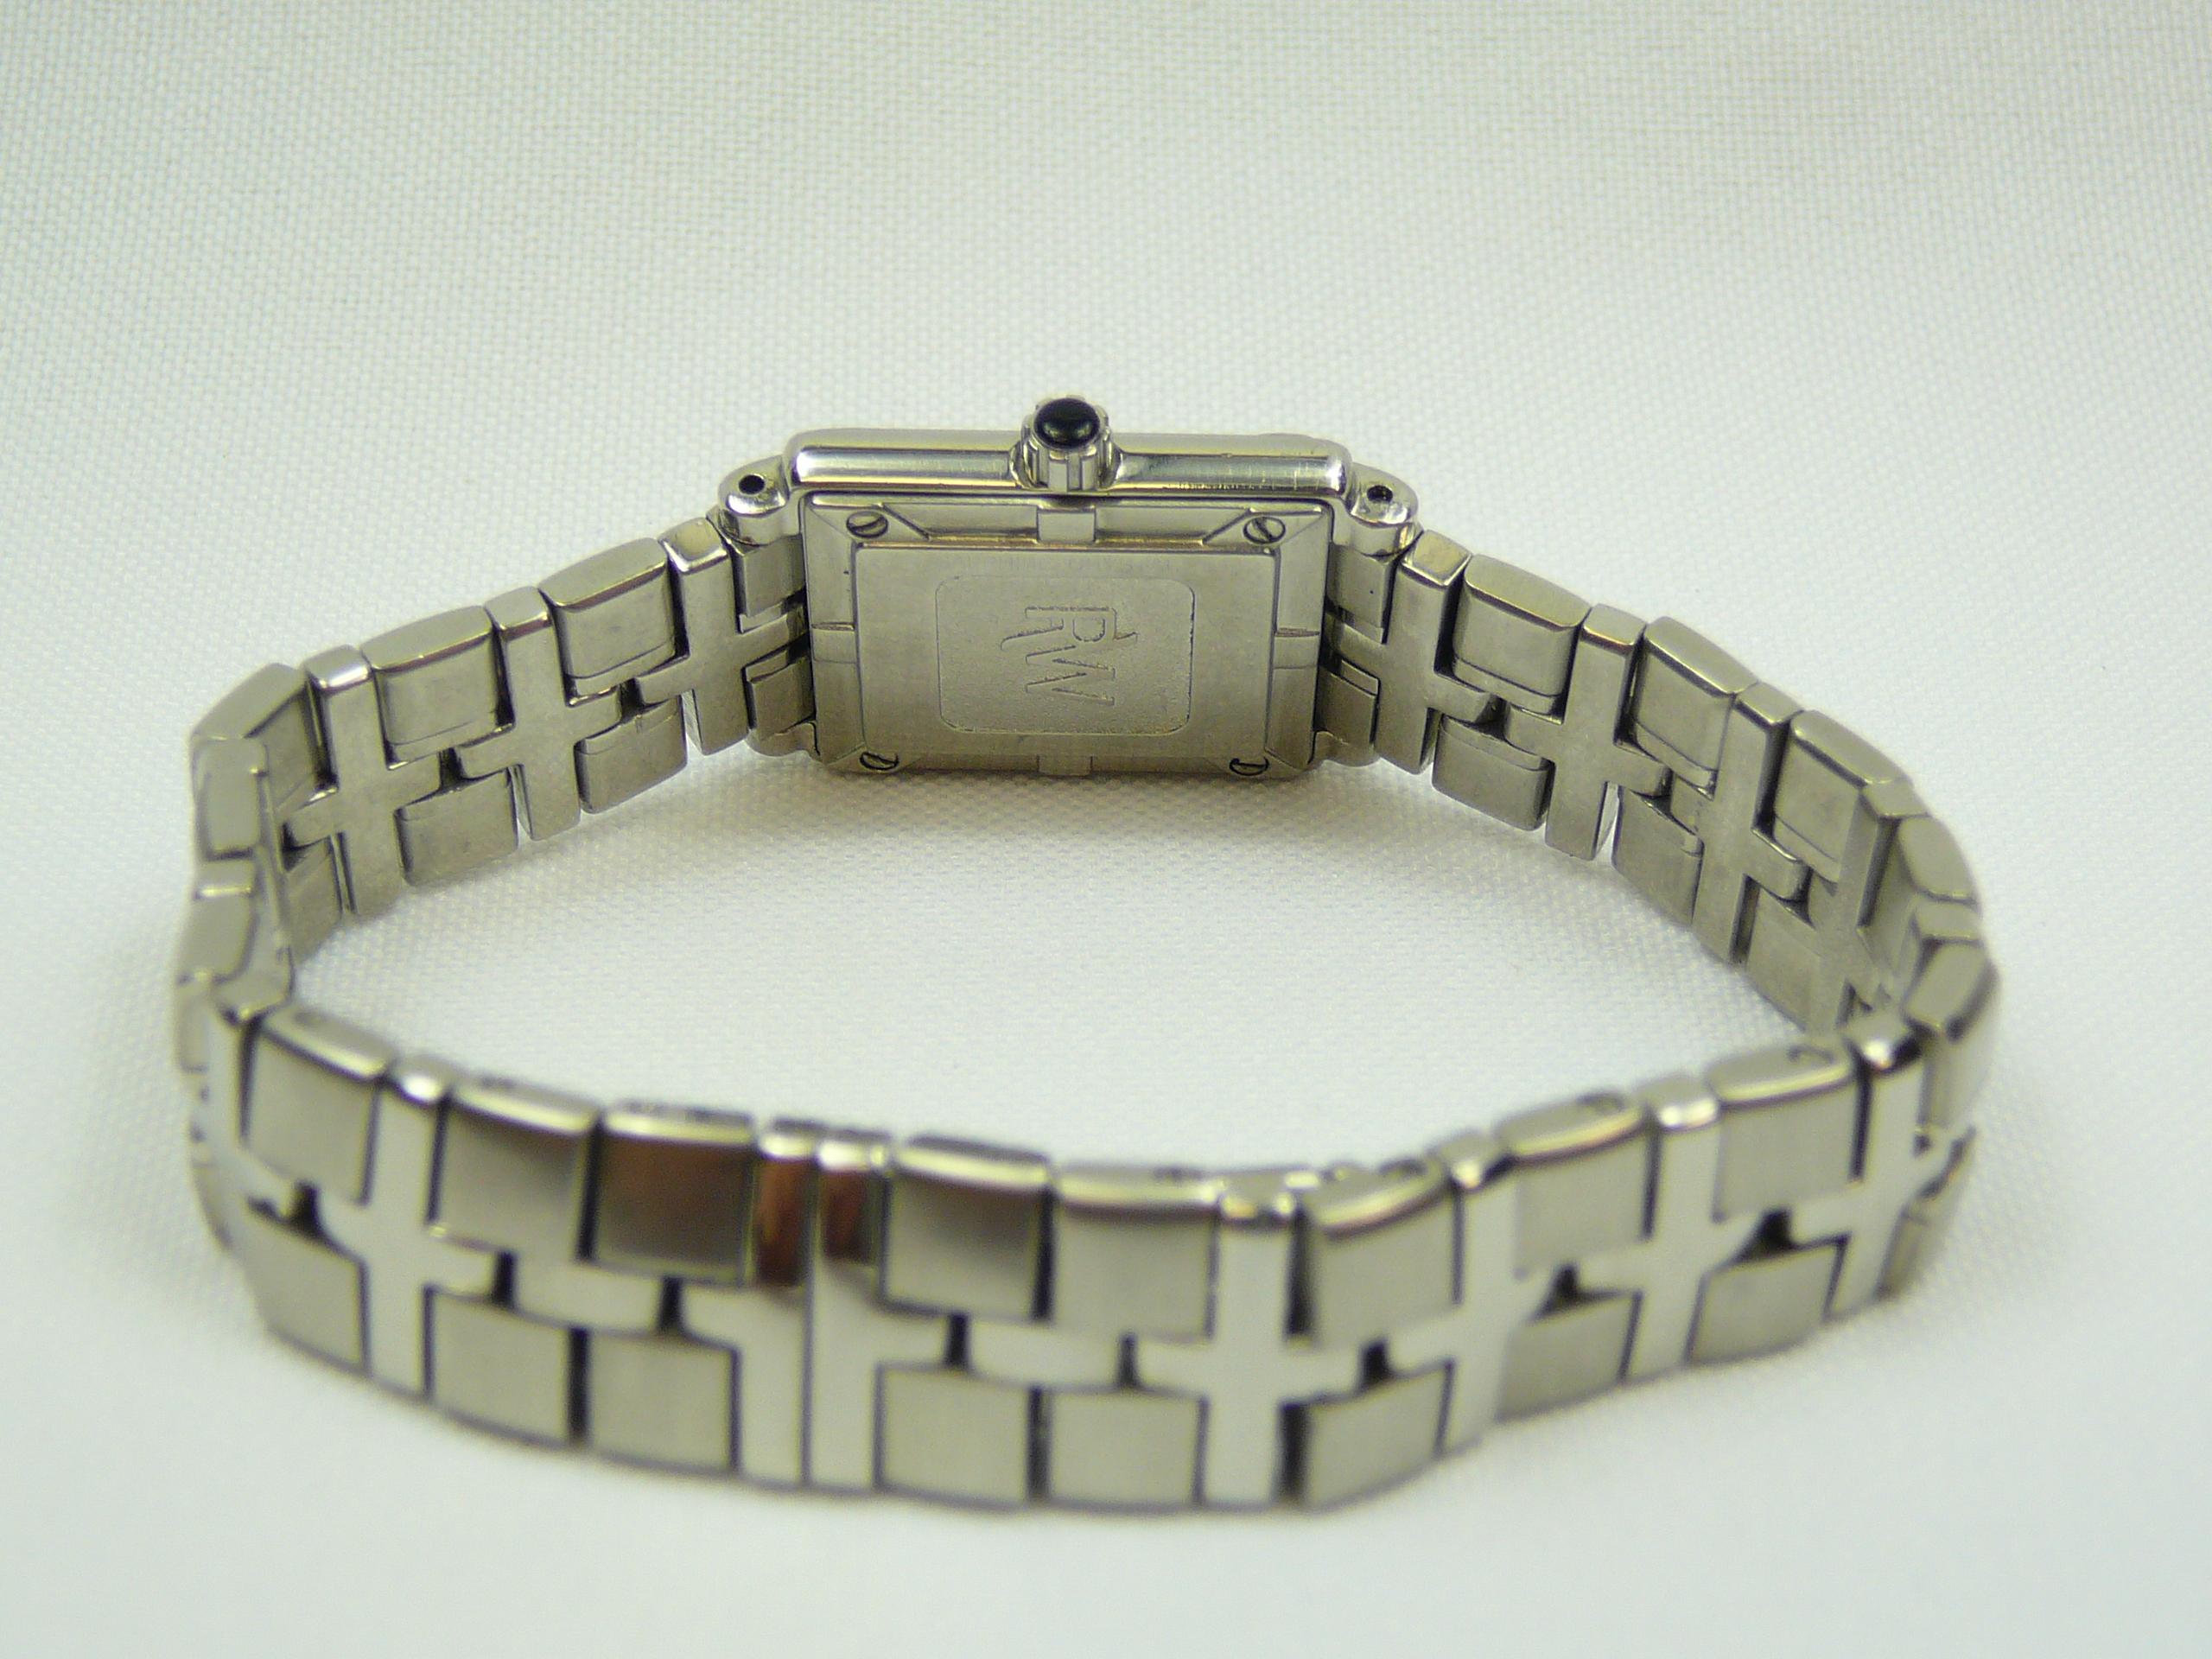 Ladies Raymond Weil Wrist Watch - Image 3 of 3